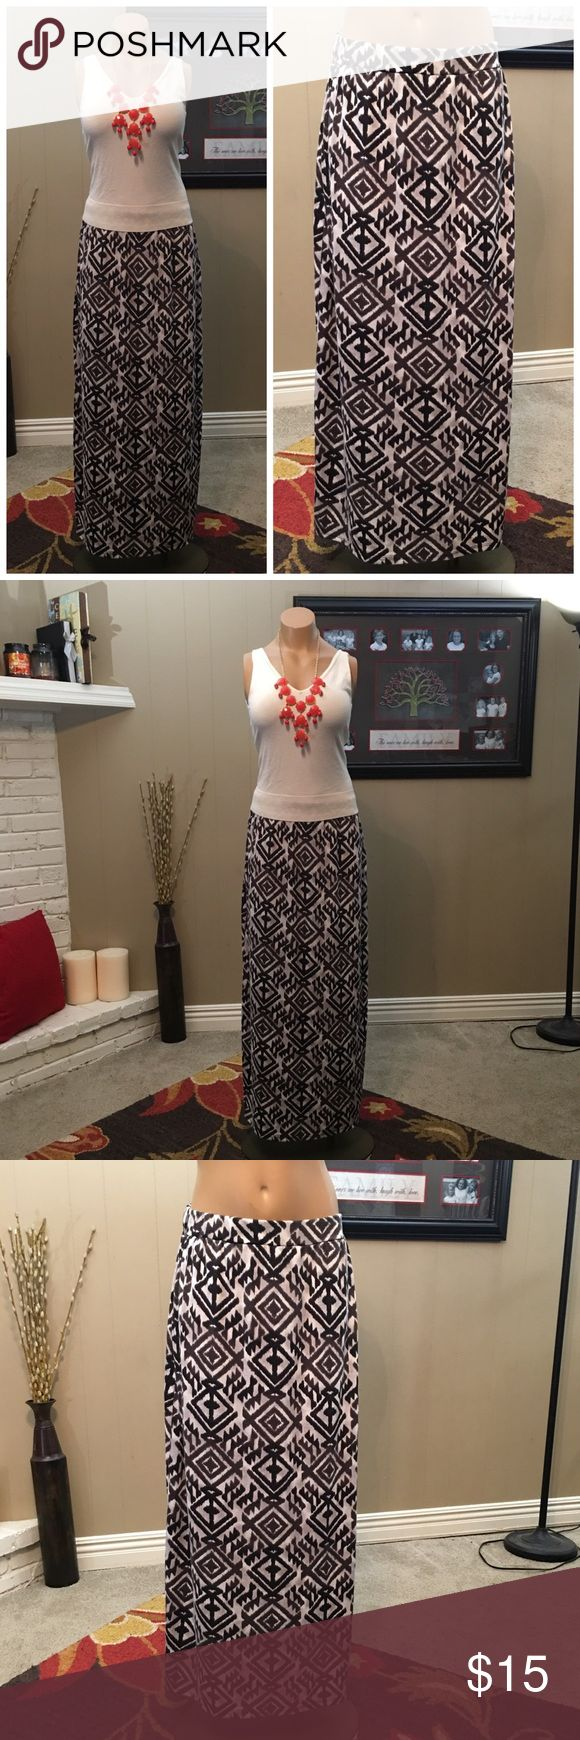 Dark gray & cream Aztec maxi skirt Comfy dark gray and cream Aztec print maxi skirt. Skirts Maxi